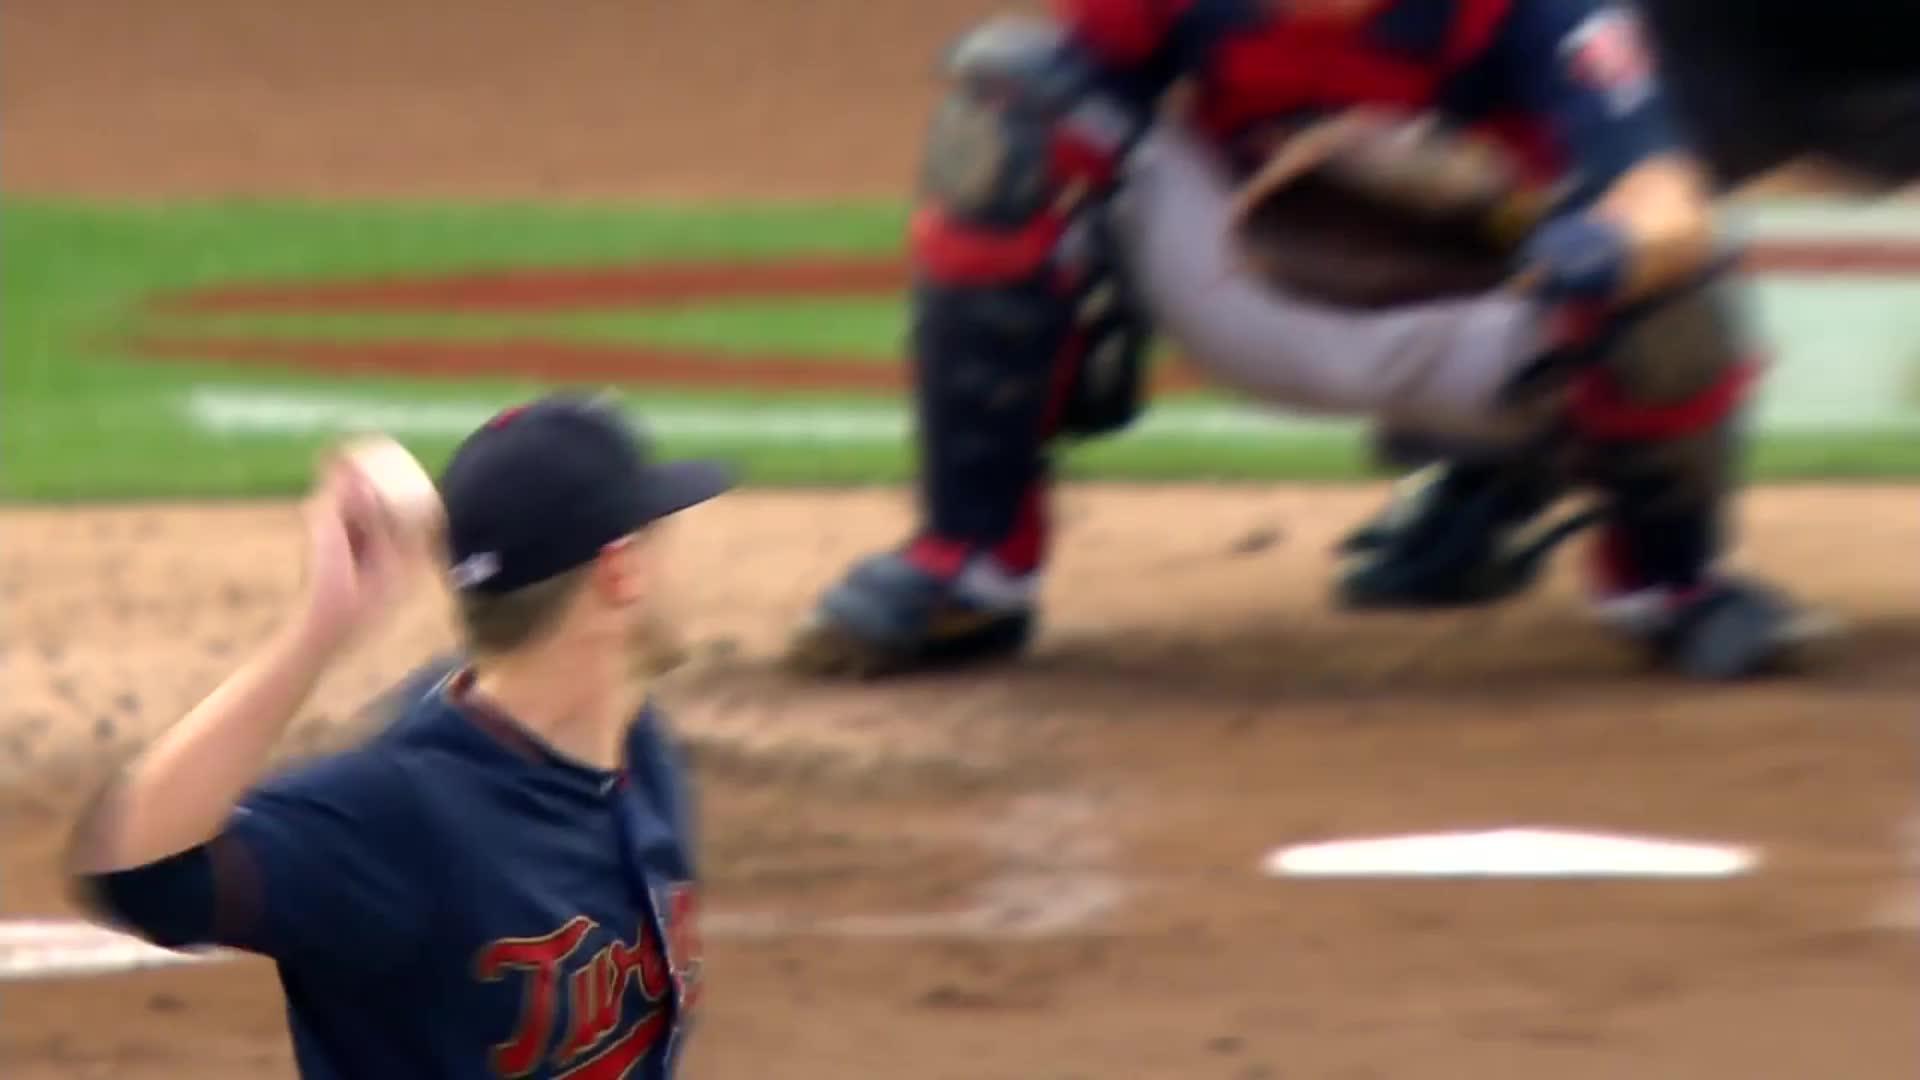 atlanta, atlanta braves, baseball, braves, Josh Donaldson starts walking to first base before pitch reaches catcher. GIFs